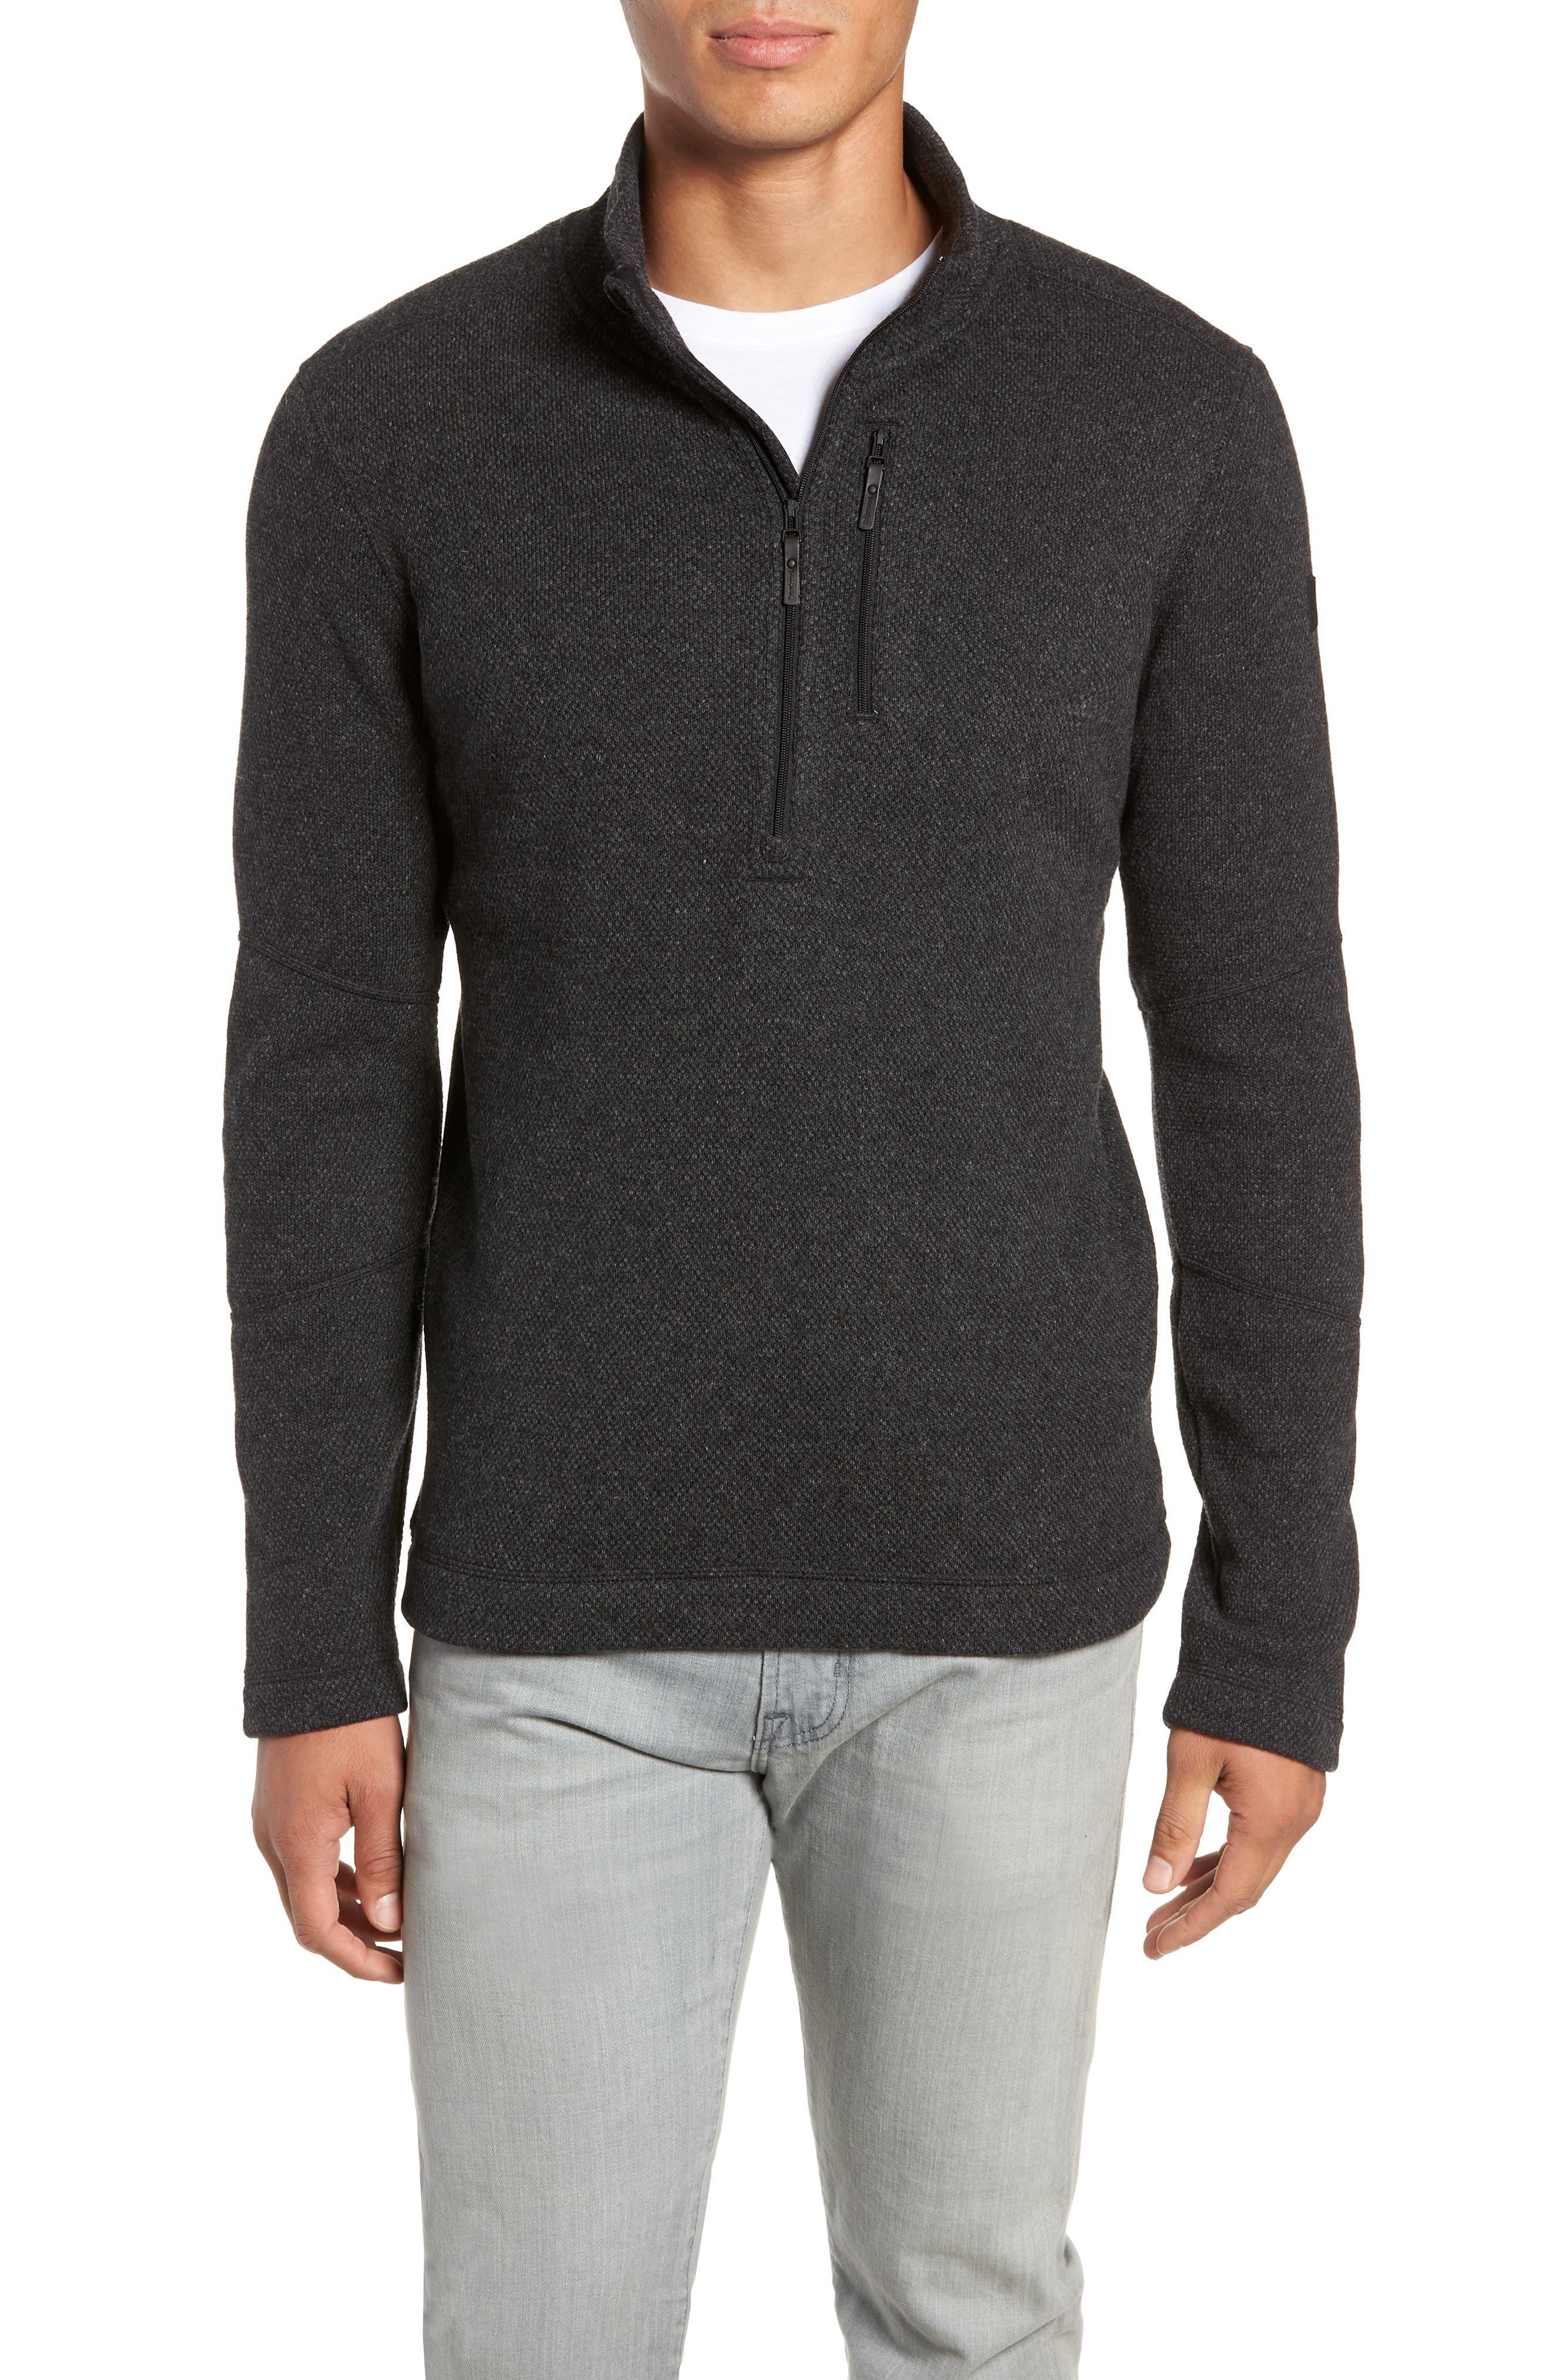 Smartwool Hudson Trail Regular Fit Fleece Half-Zip Sweater